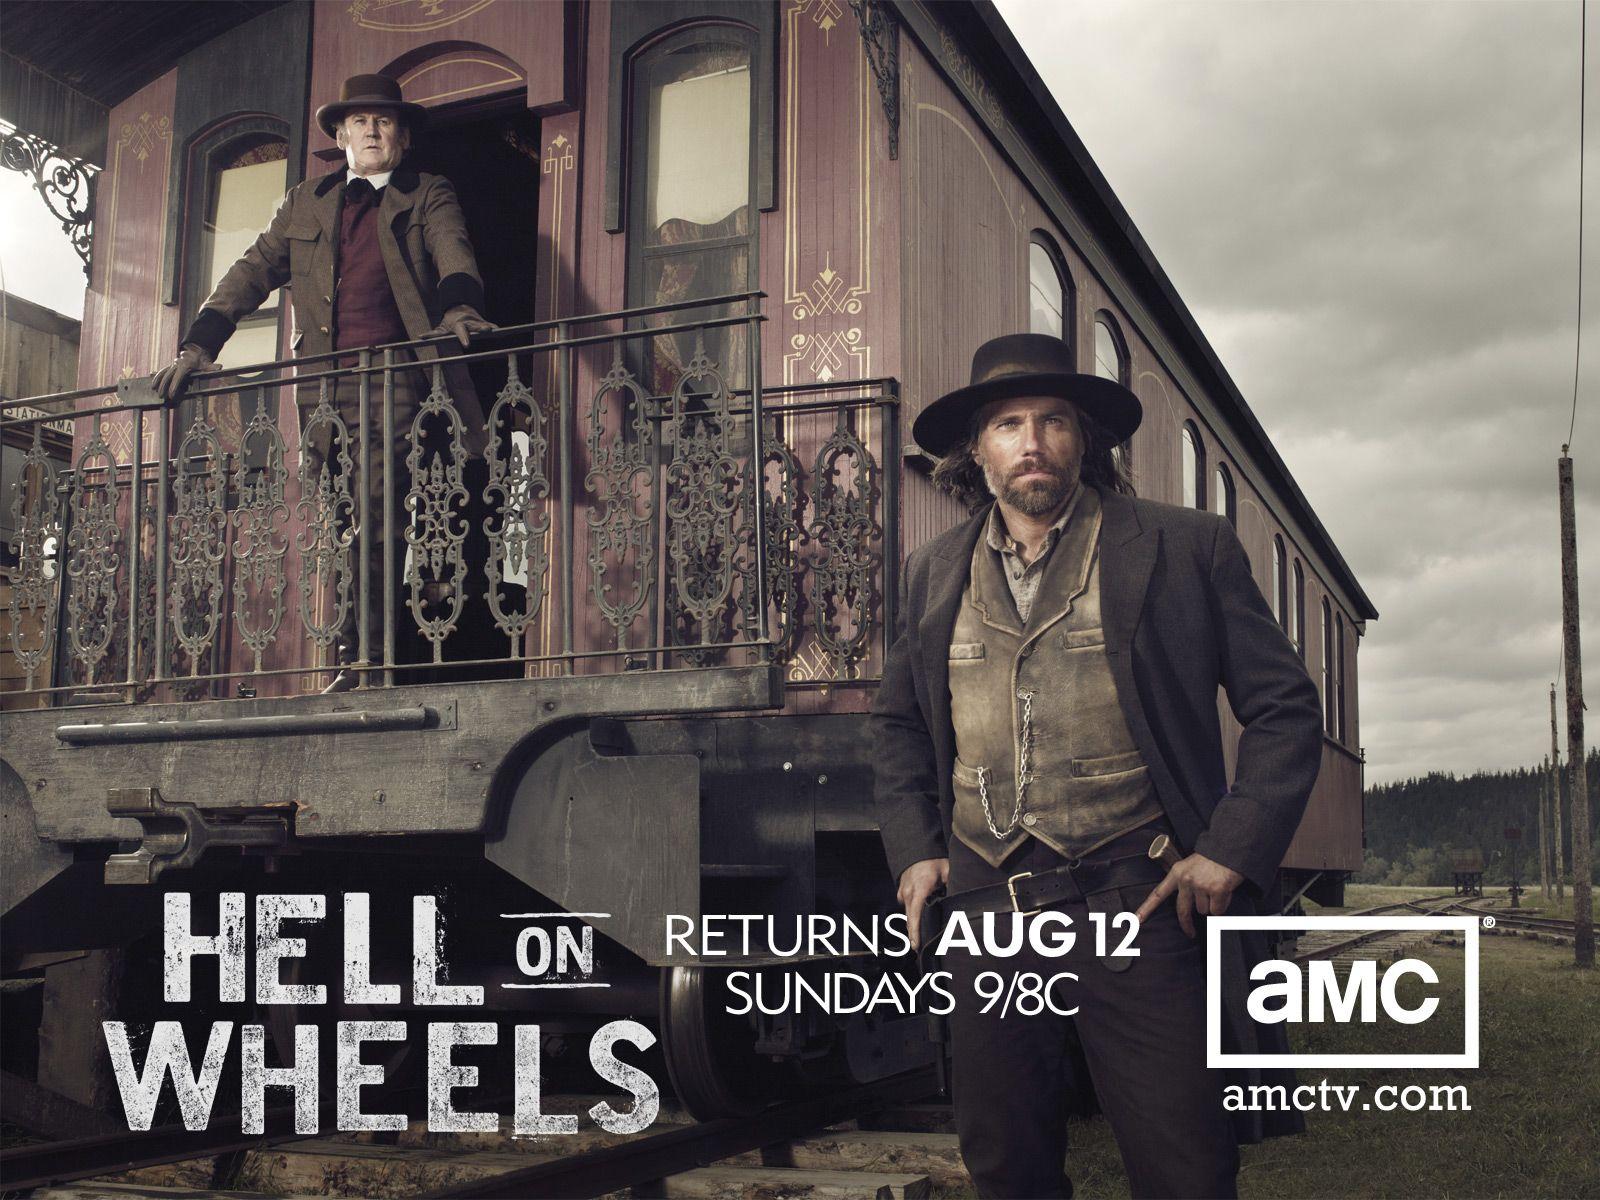 Amc Hell On Wheels Wallpaper